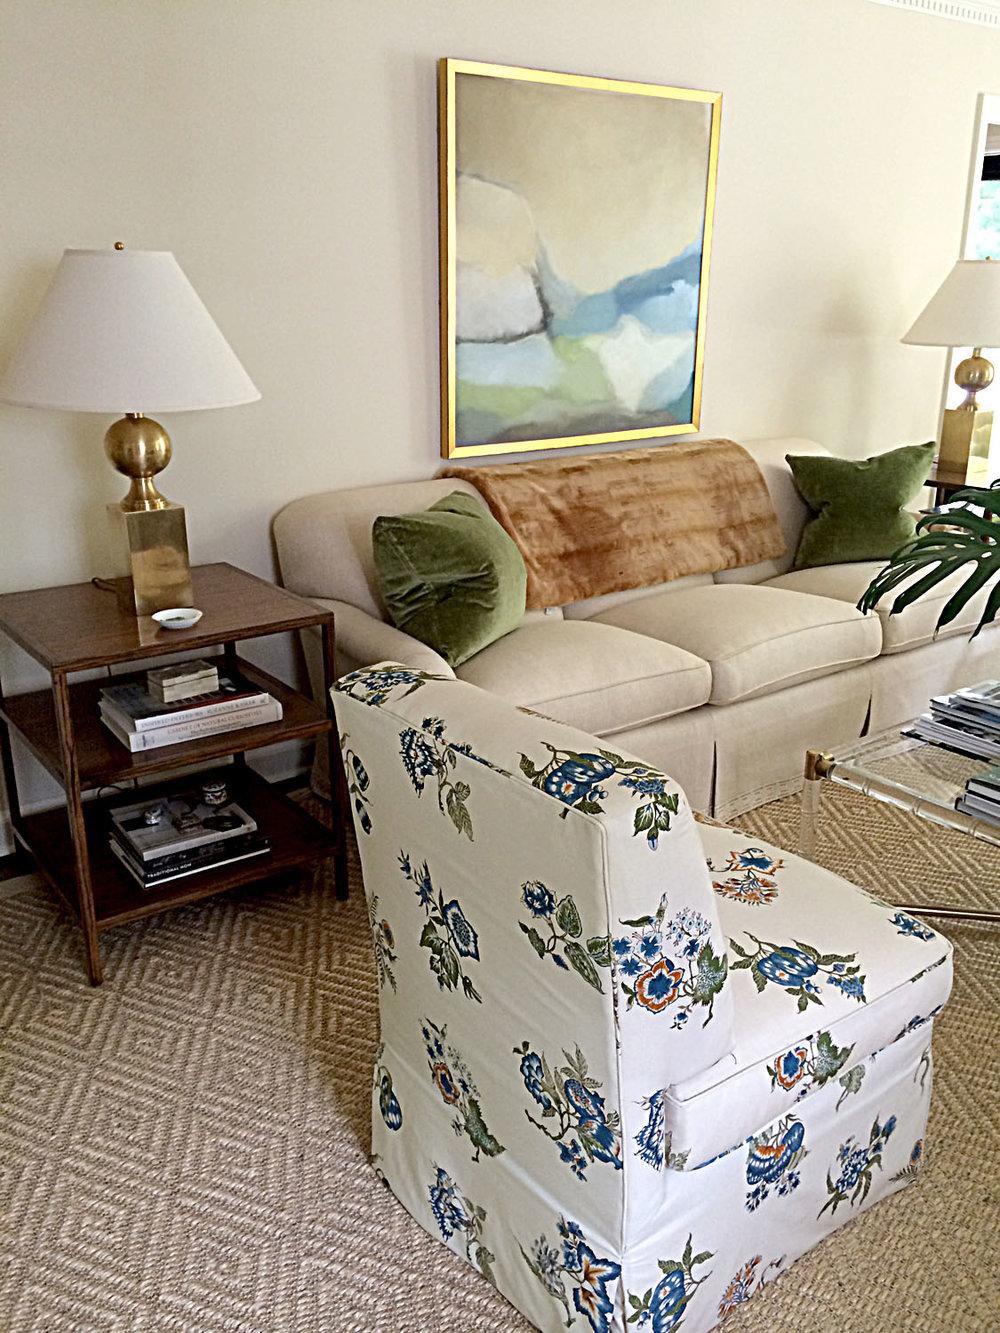 flowerchair-creamsofa.jpg